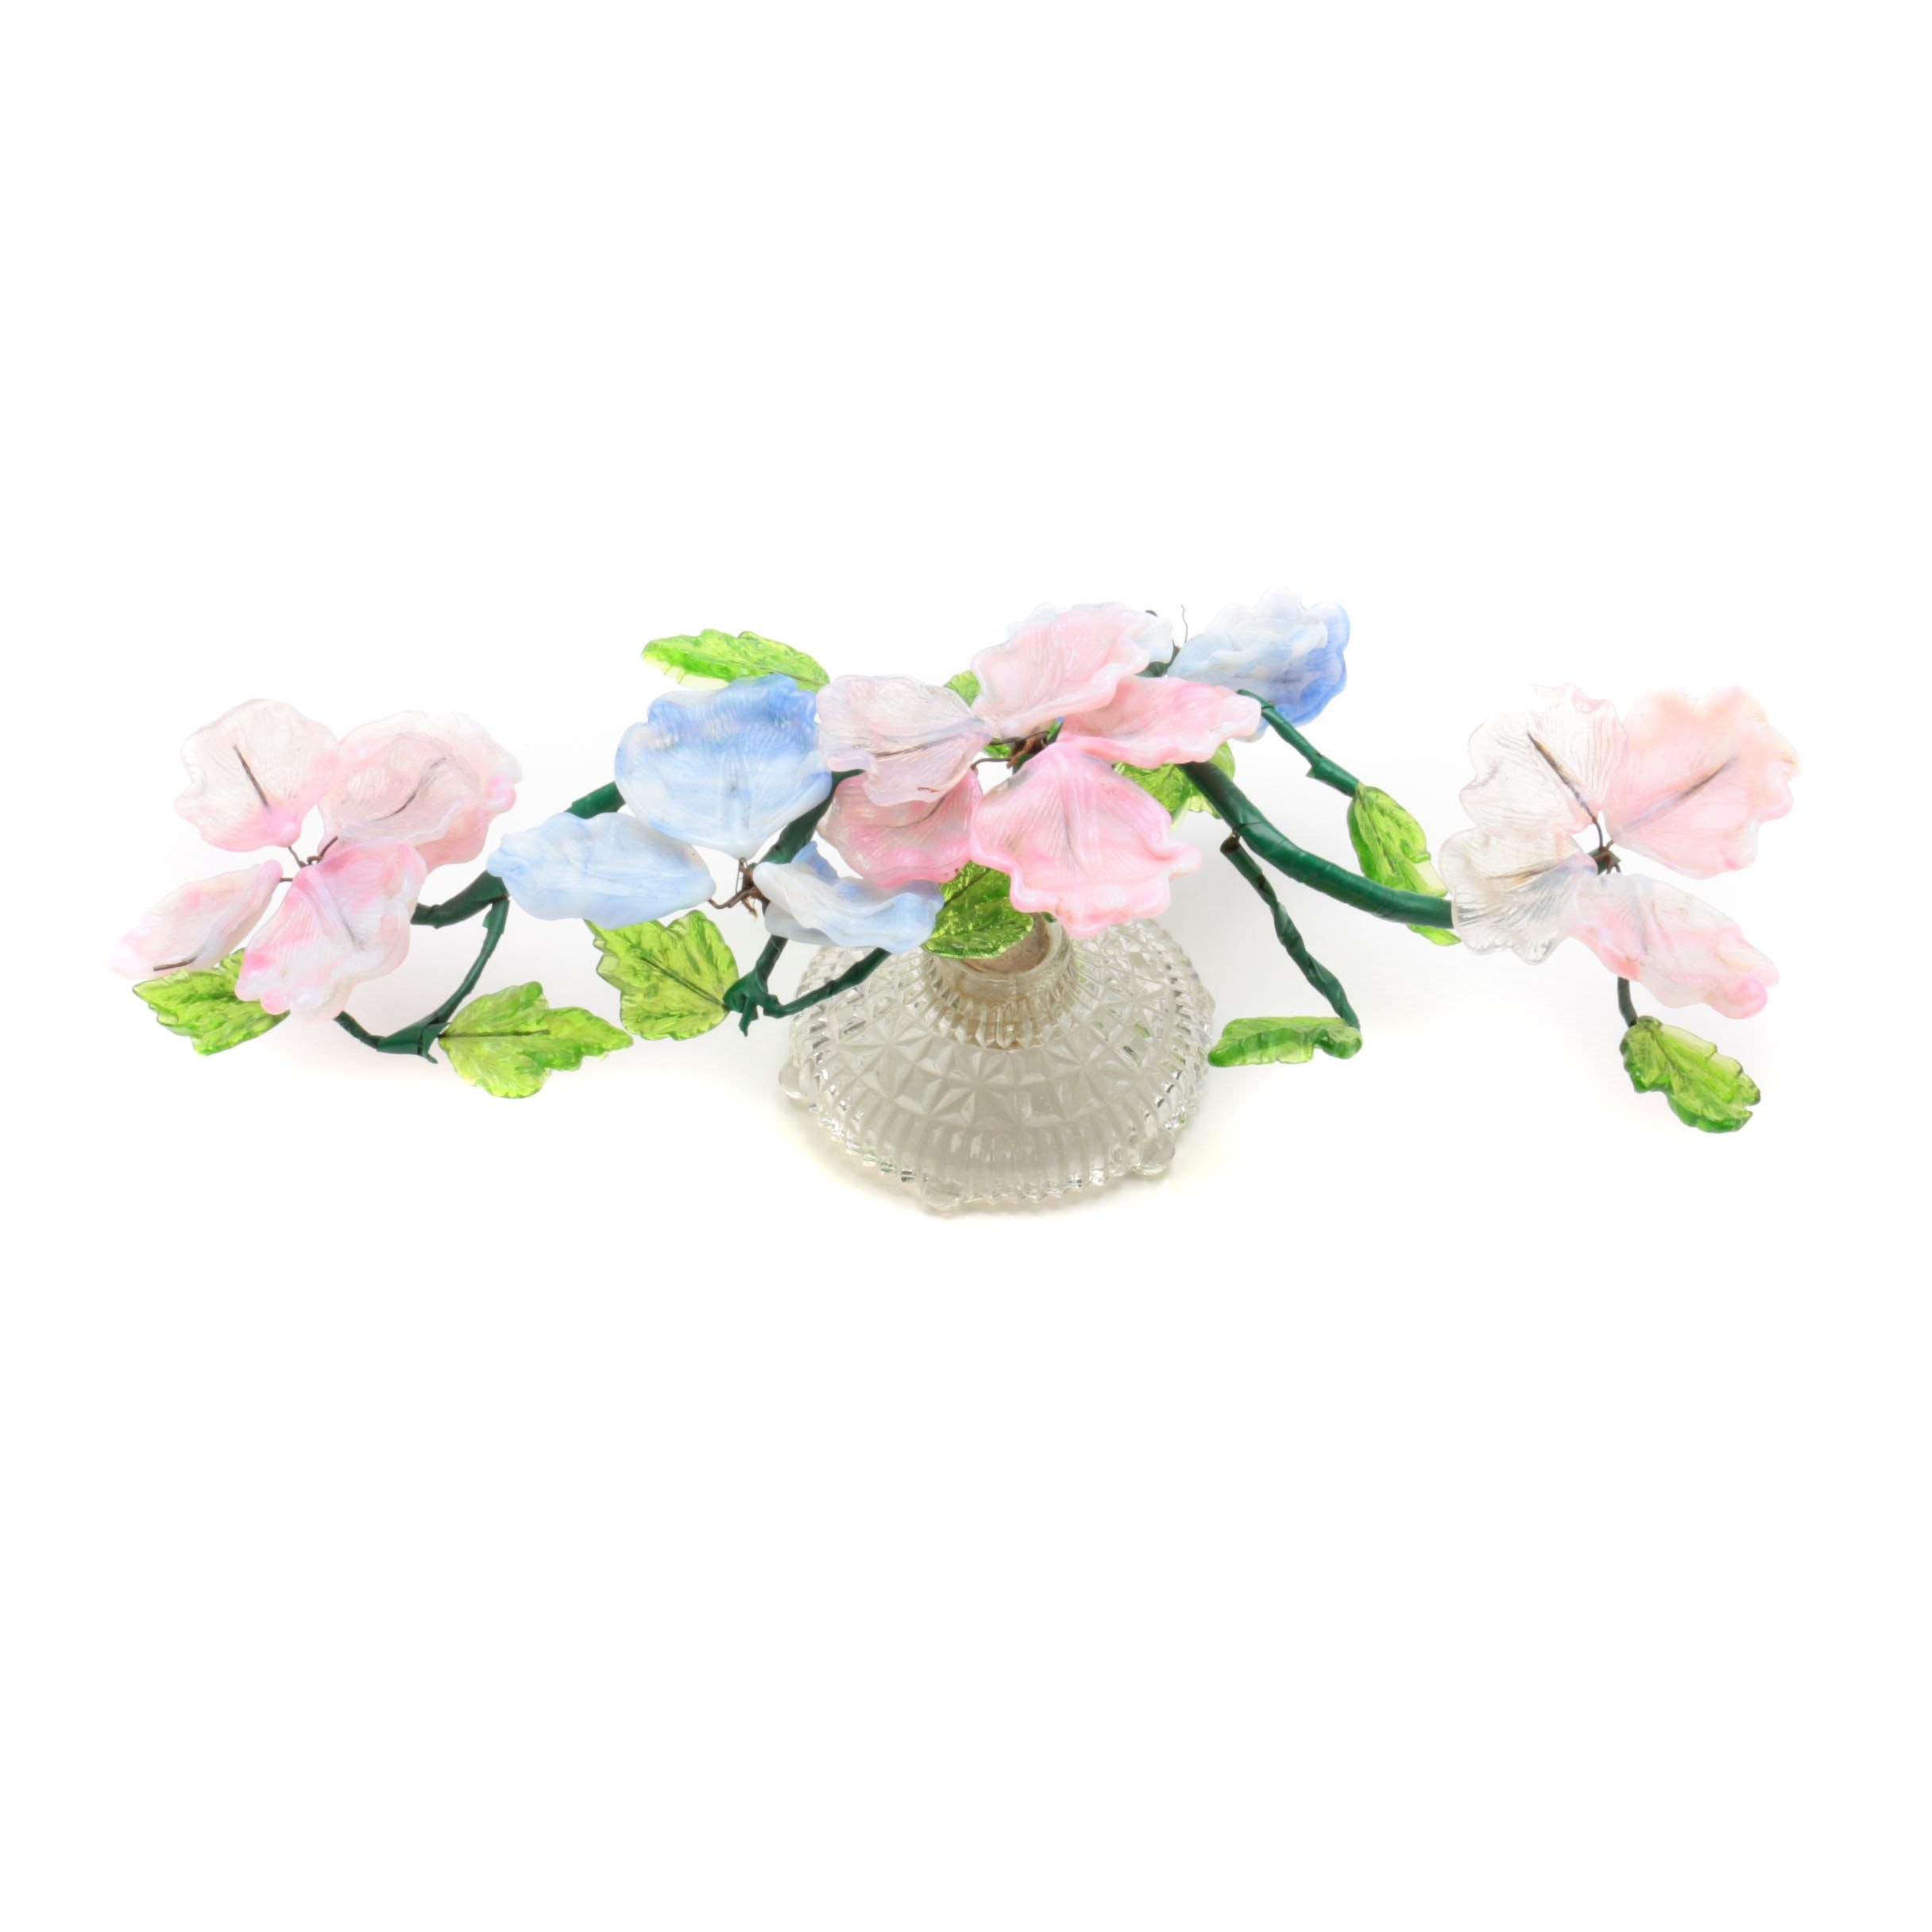 Vintage Glass Flower Bouquet Centerpiece